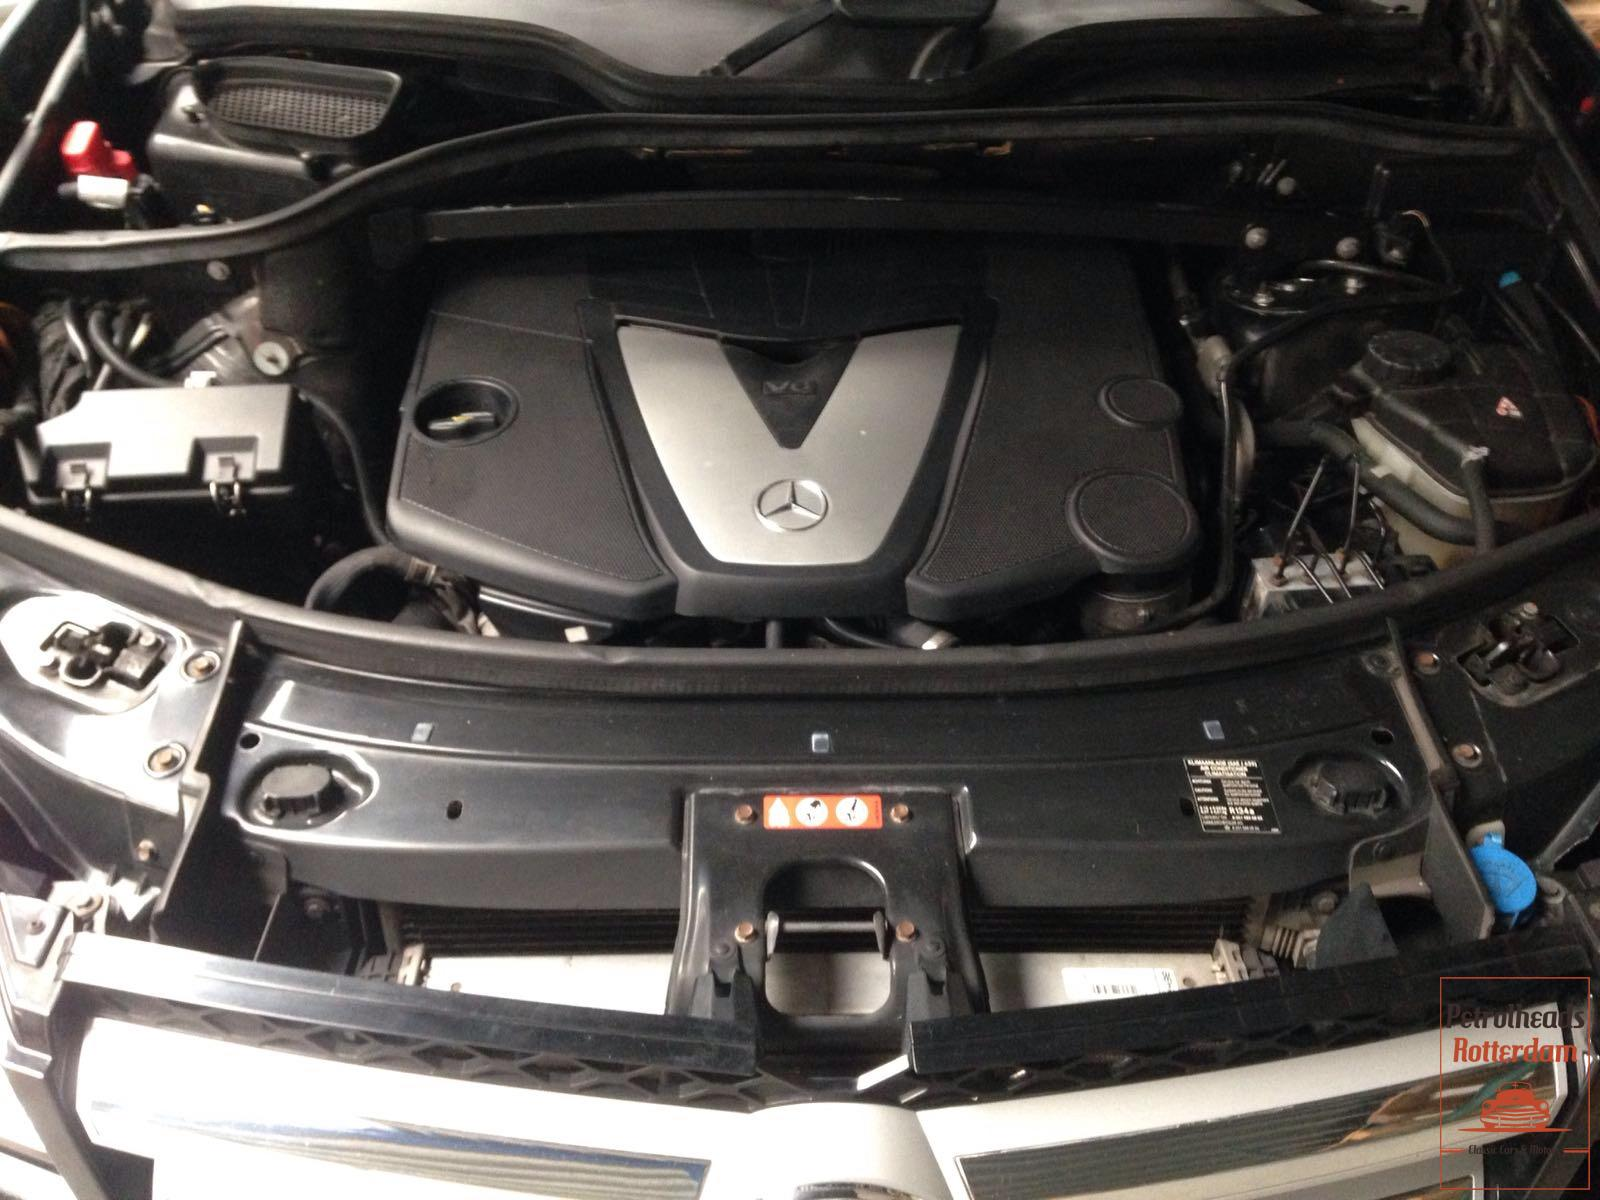 Mercedes GL320 CDI 4-Matic 2007 Engine